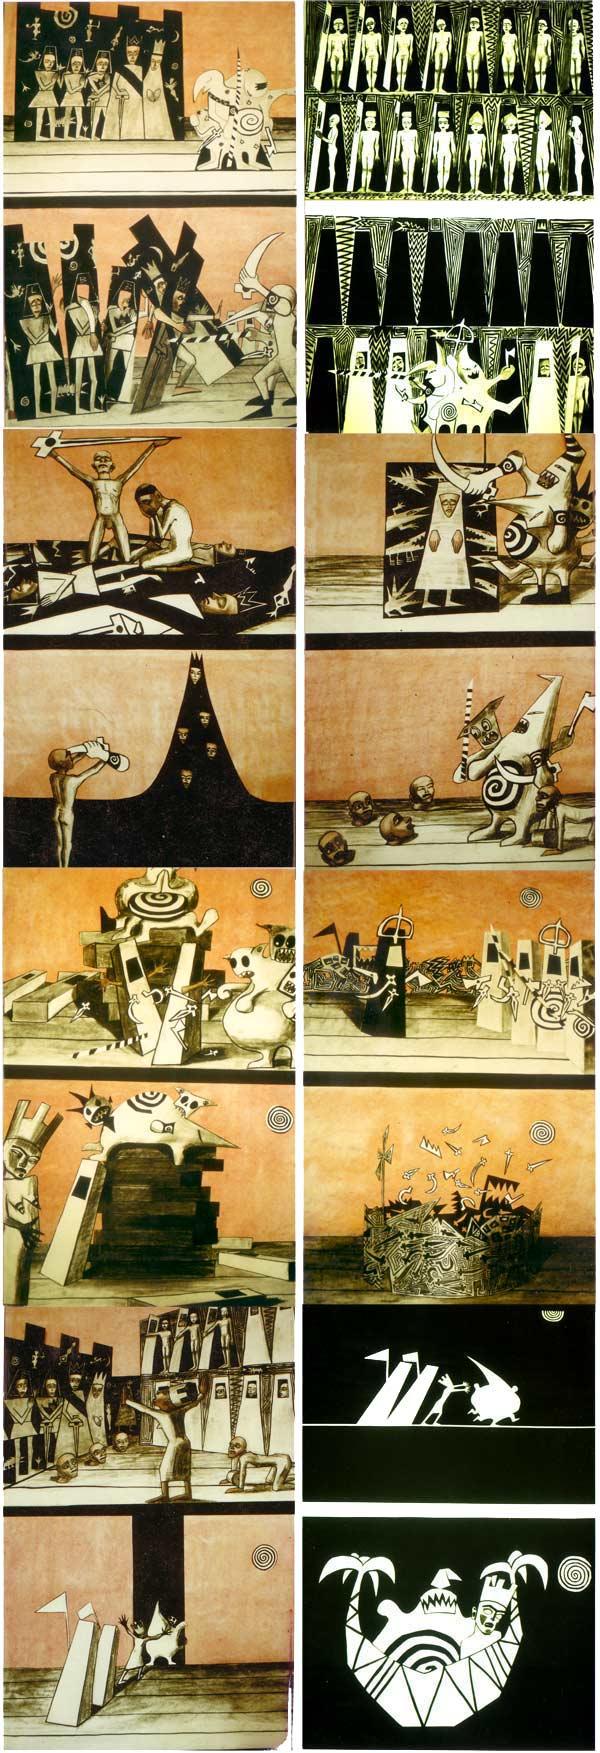 'roi ubu' szenografische illustrationen